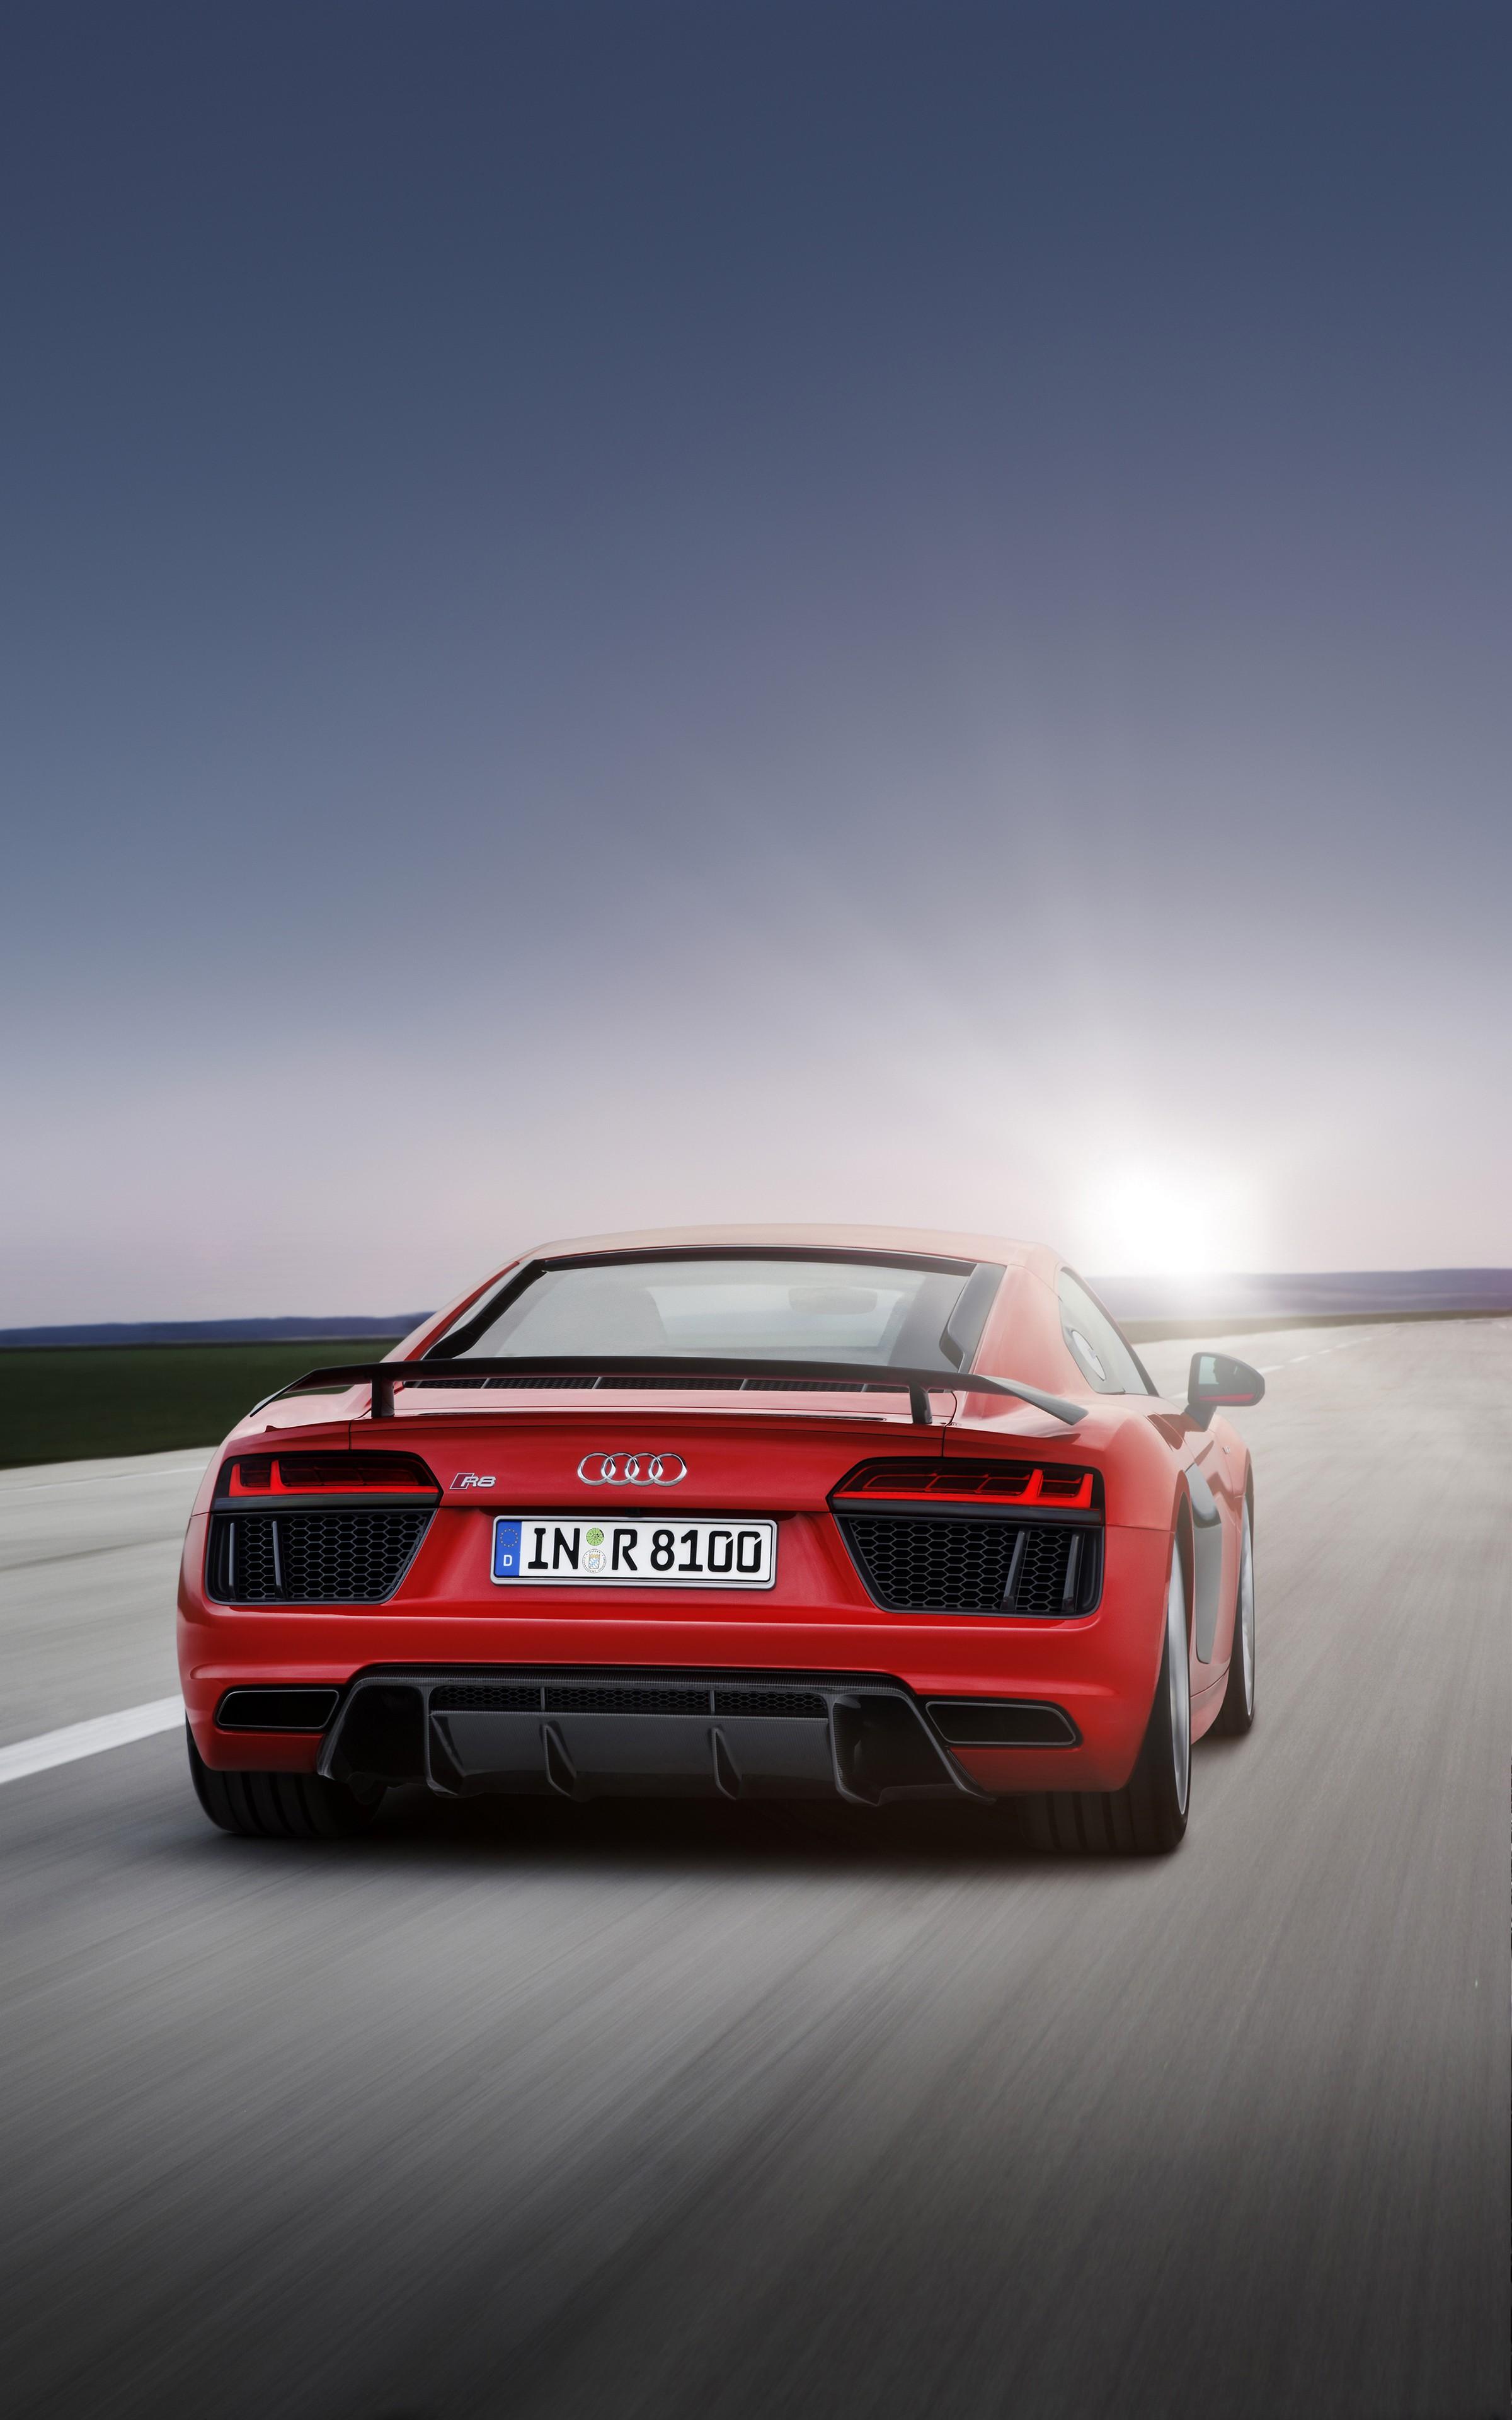 Wallpaper Portrait Display Lamborghini Aventador Red Cars Super